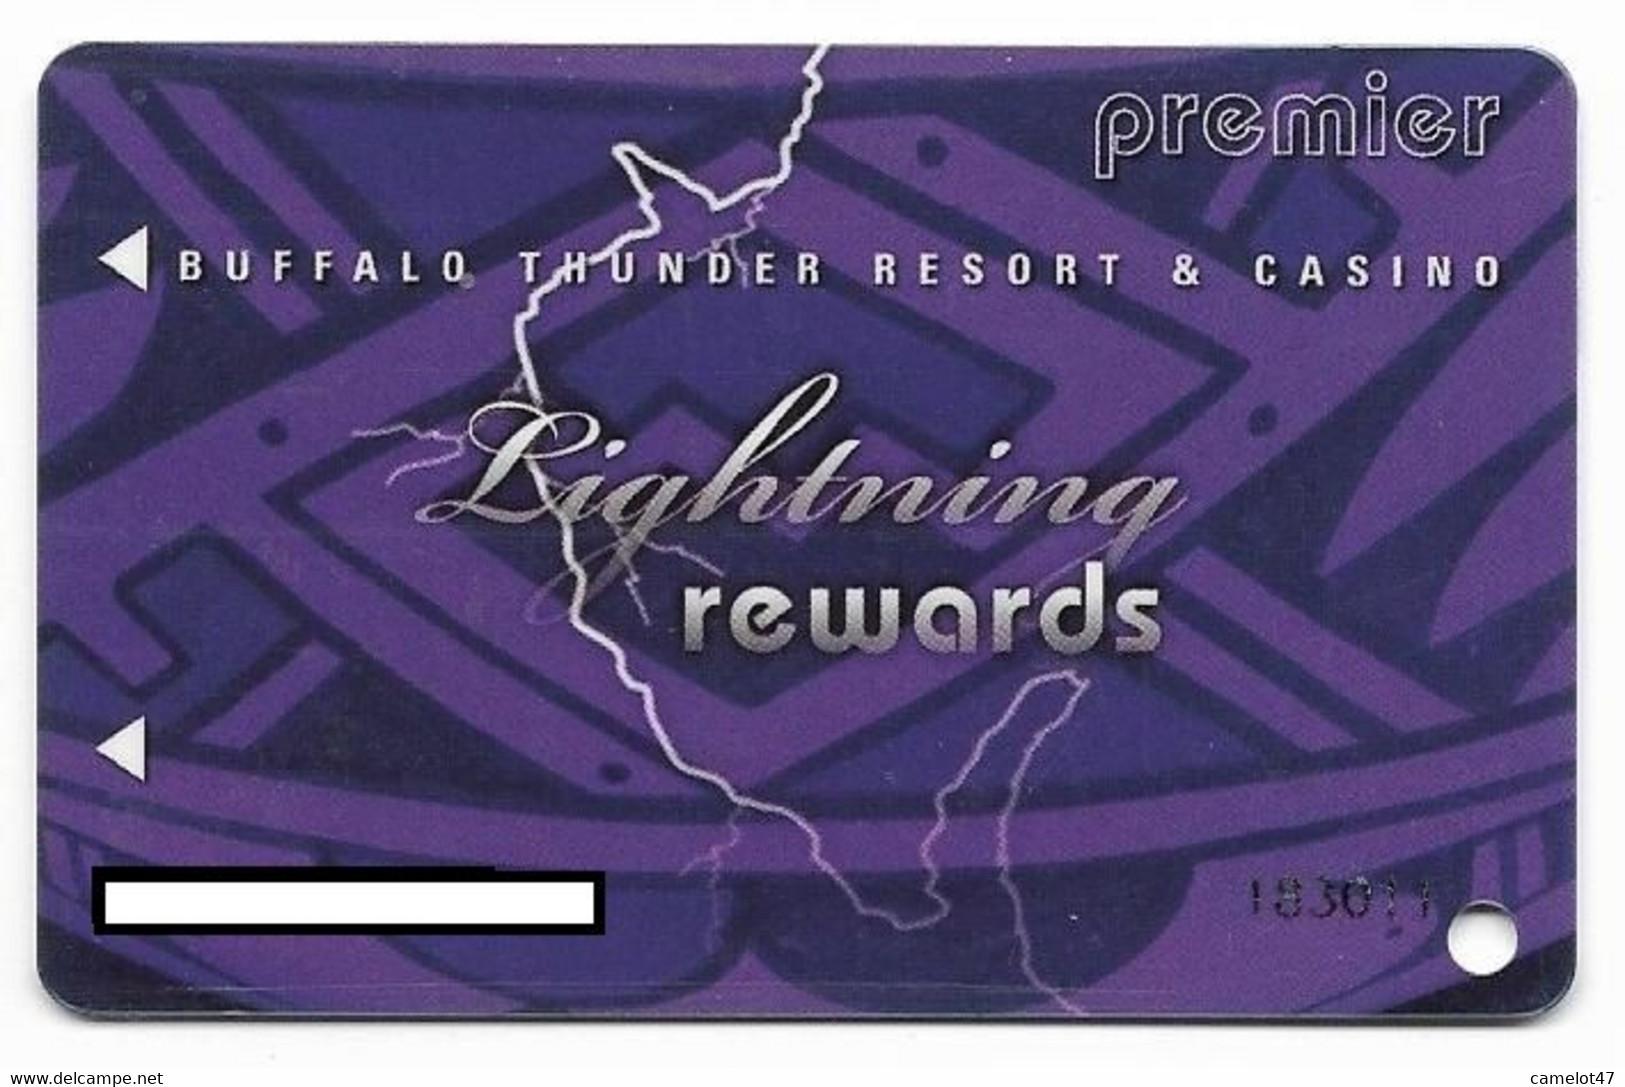 Buffalo Thunder Resort & Casino, Santa Fe, NM,  U.S.A., Older Used Slot Or Player's Card, # Buffalothunder-2 - Casino Cards